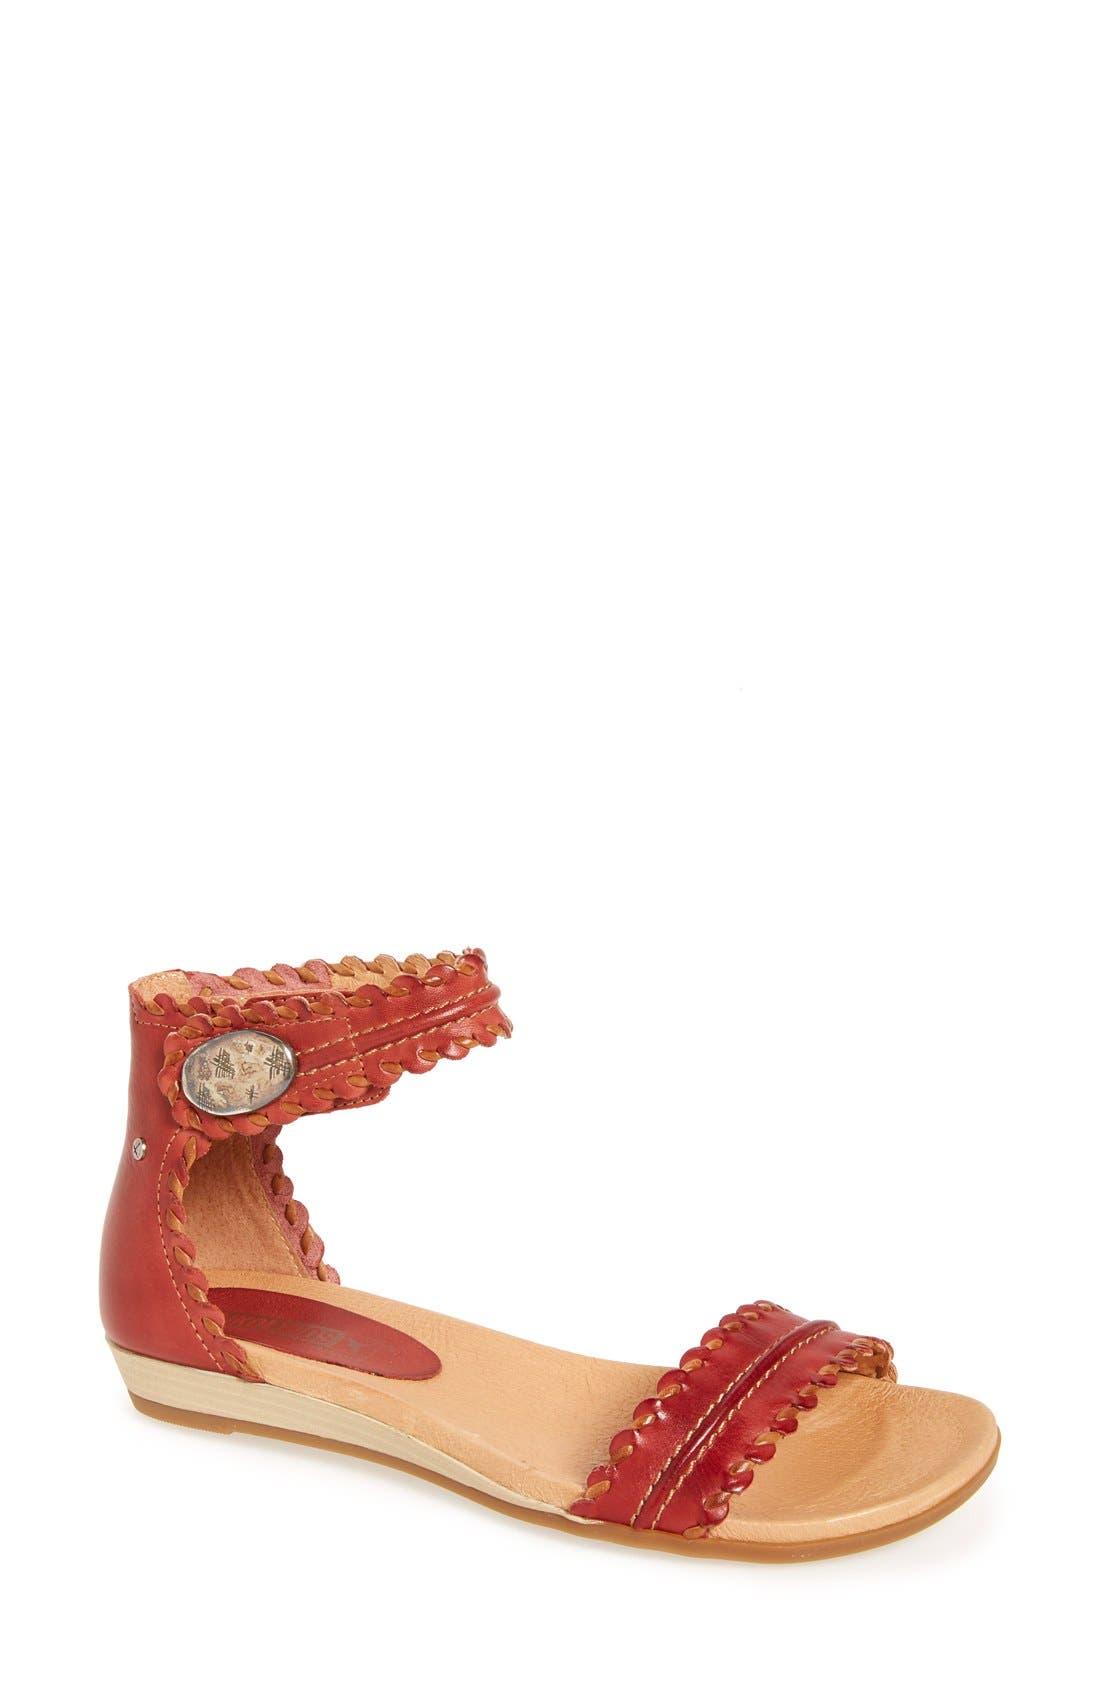 Alternate Image 1 Selected - PIKOLINOS 'Alcudia' Ankle Strap Sandal (Women)